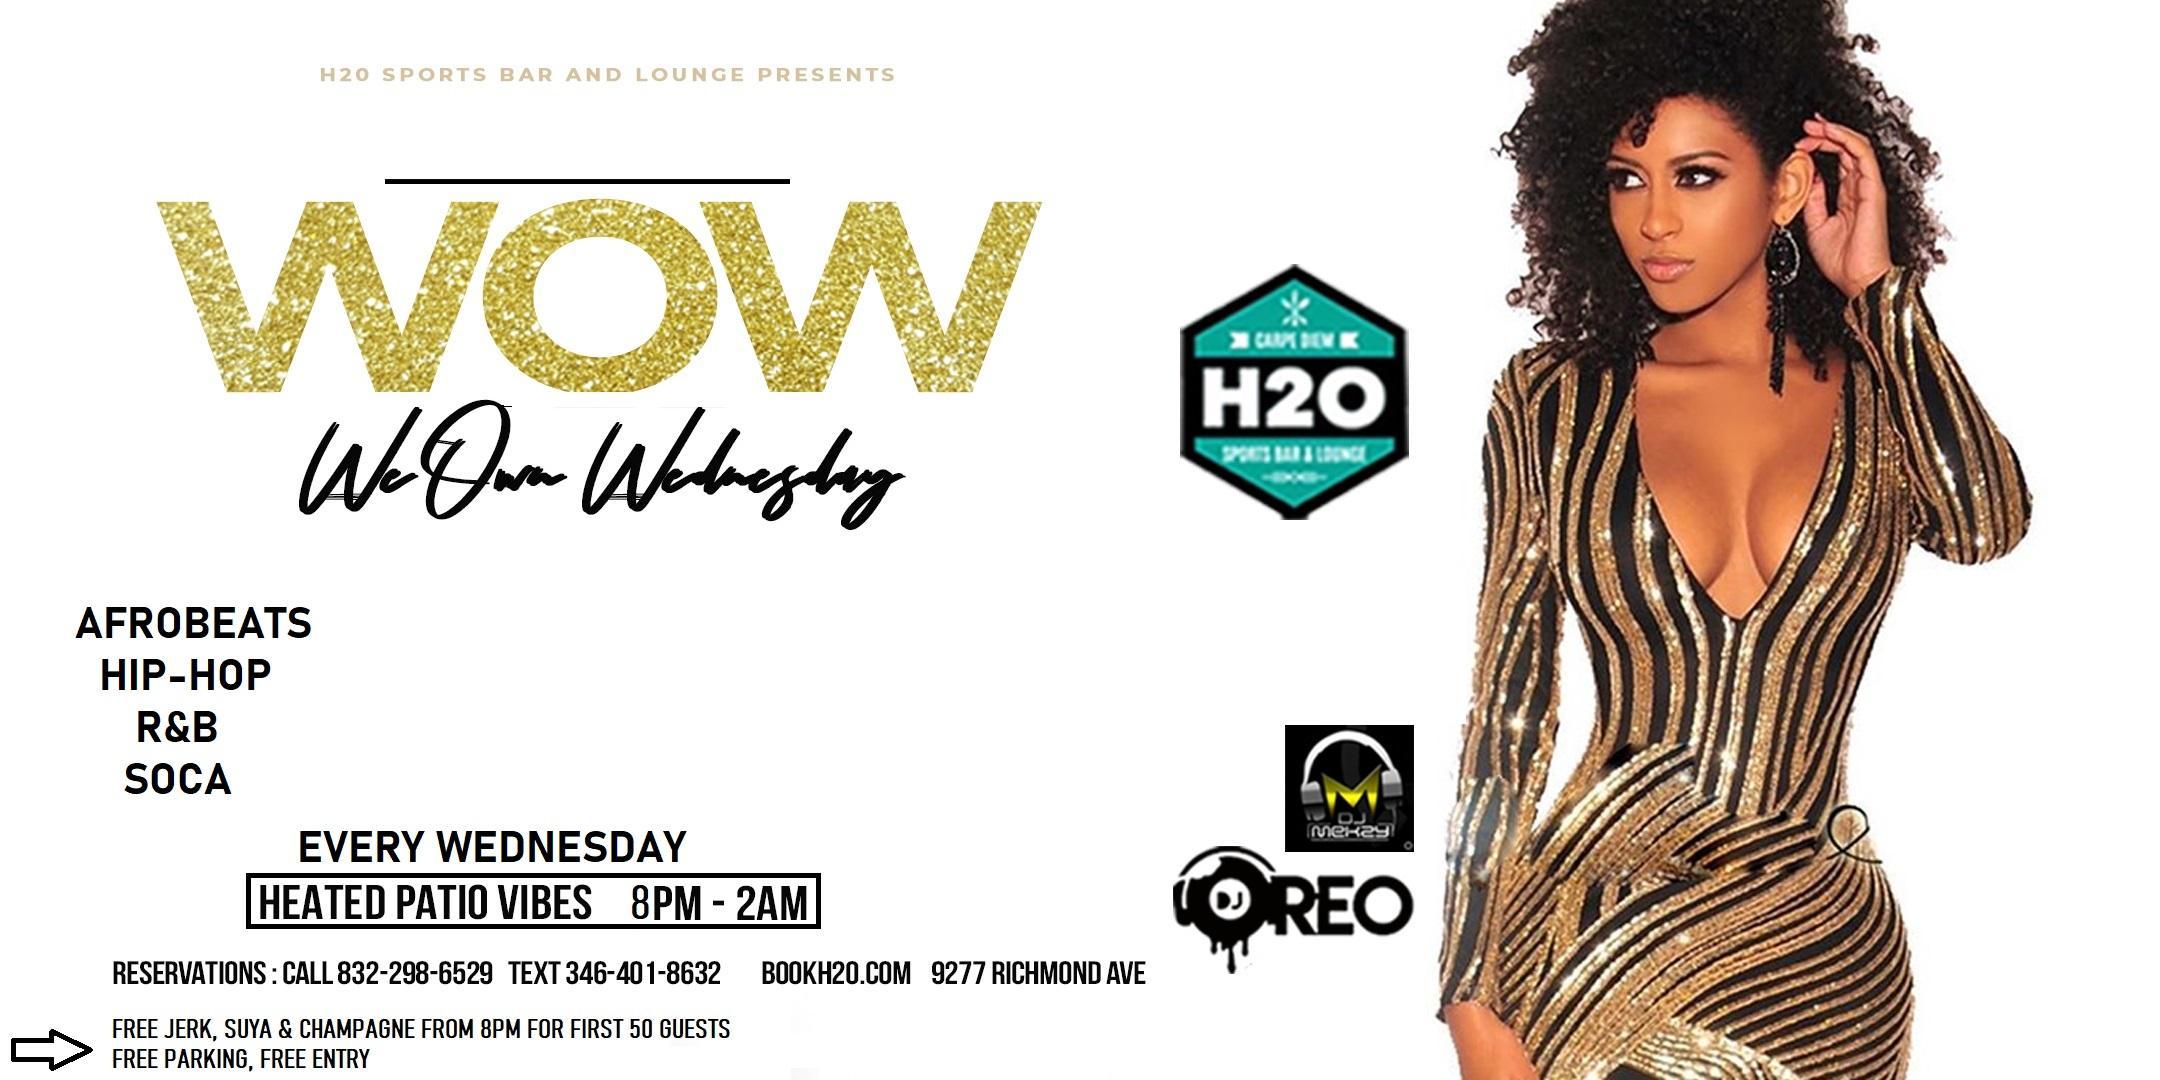 (WOW) We Own Wednesdays @H2O